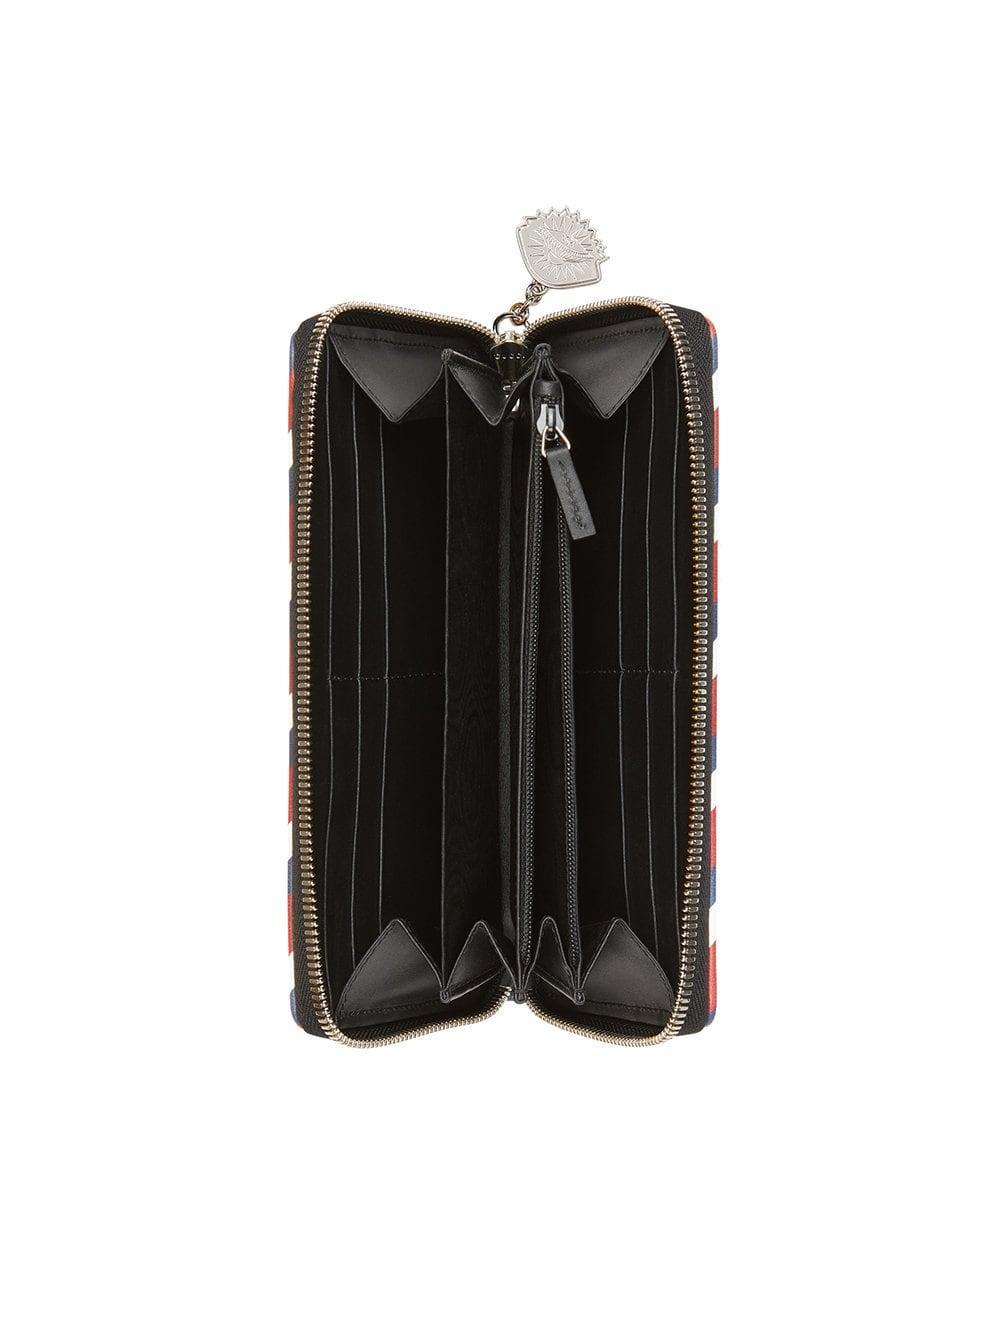 9befc677b31e Gucci - Black Night Courrier GG Supreme Zip Around Wallet for Men - Lyst.  View fullscreen